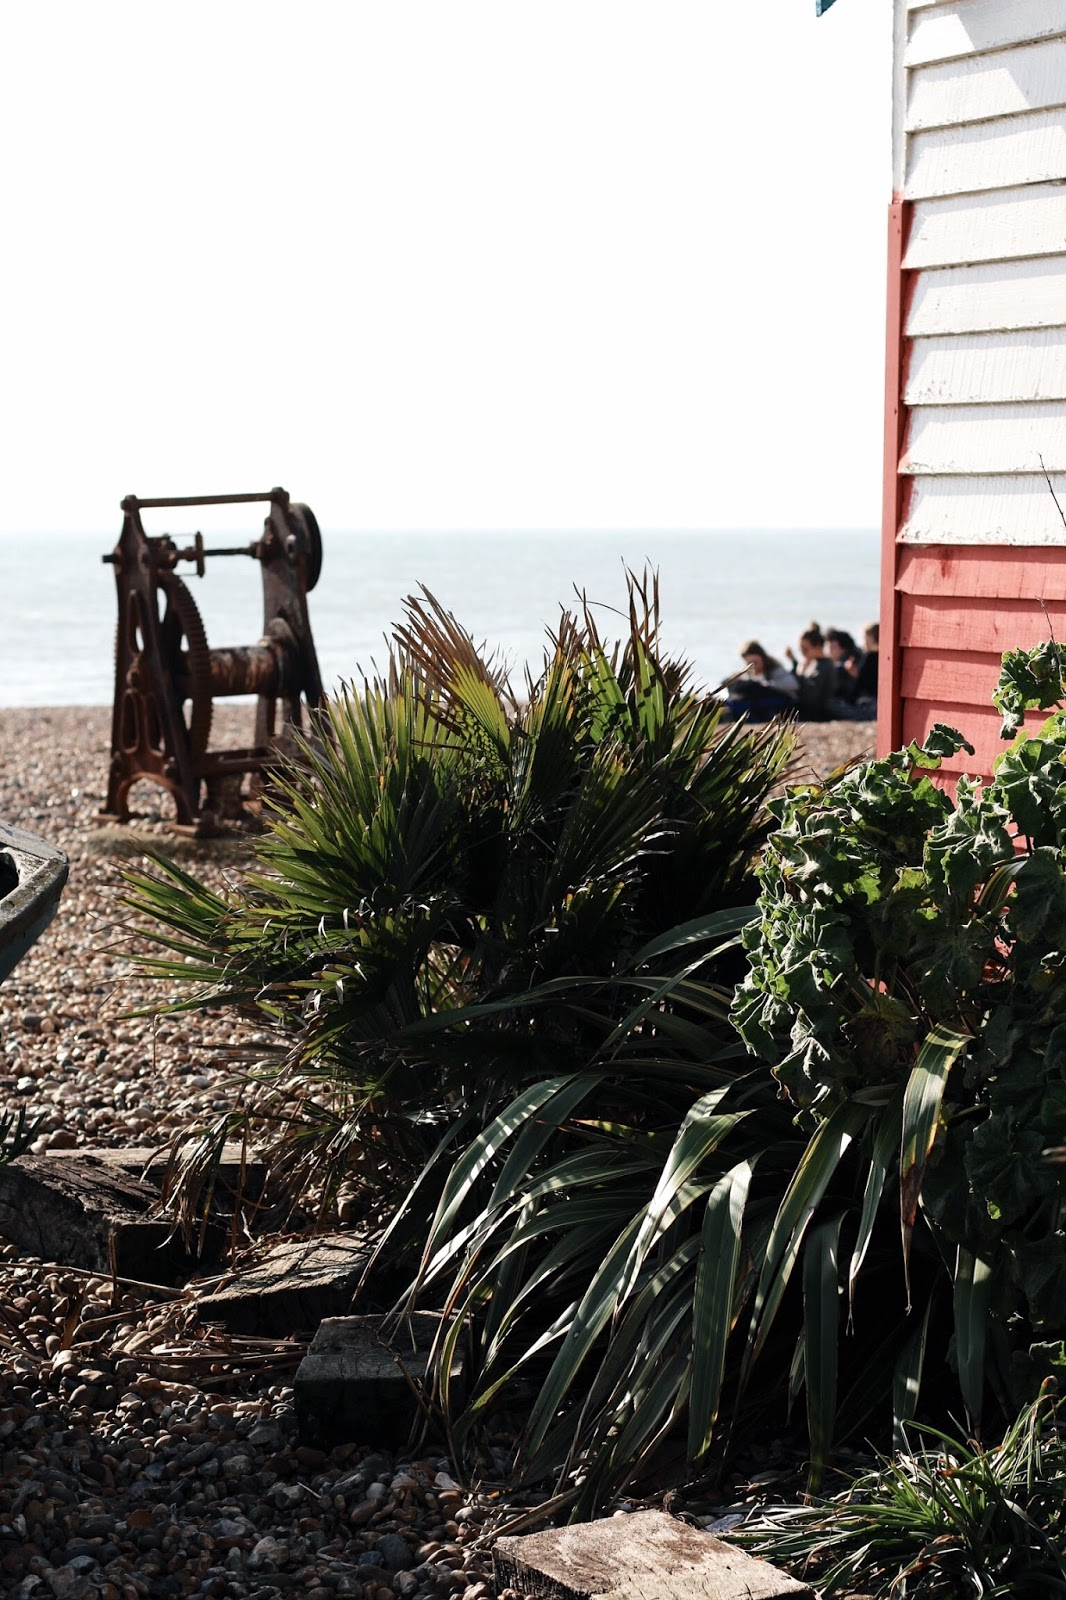 UK Brighton Beach in Winter